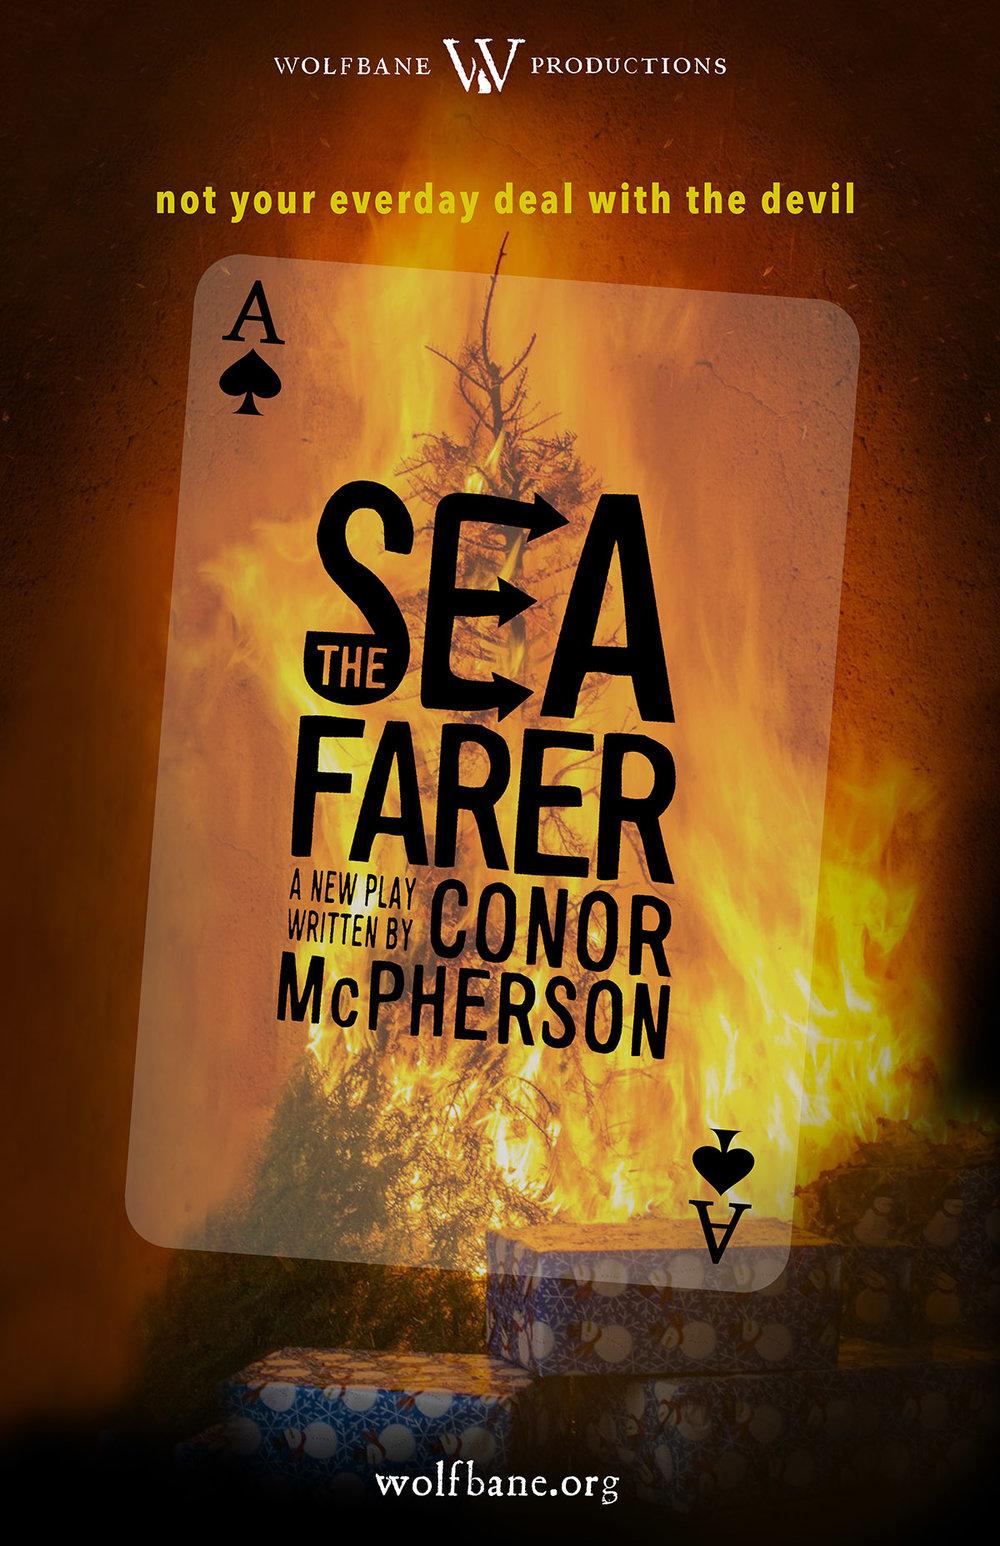 seafarer_poster-web-2.jpg